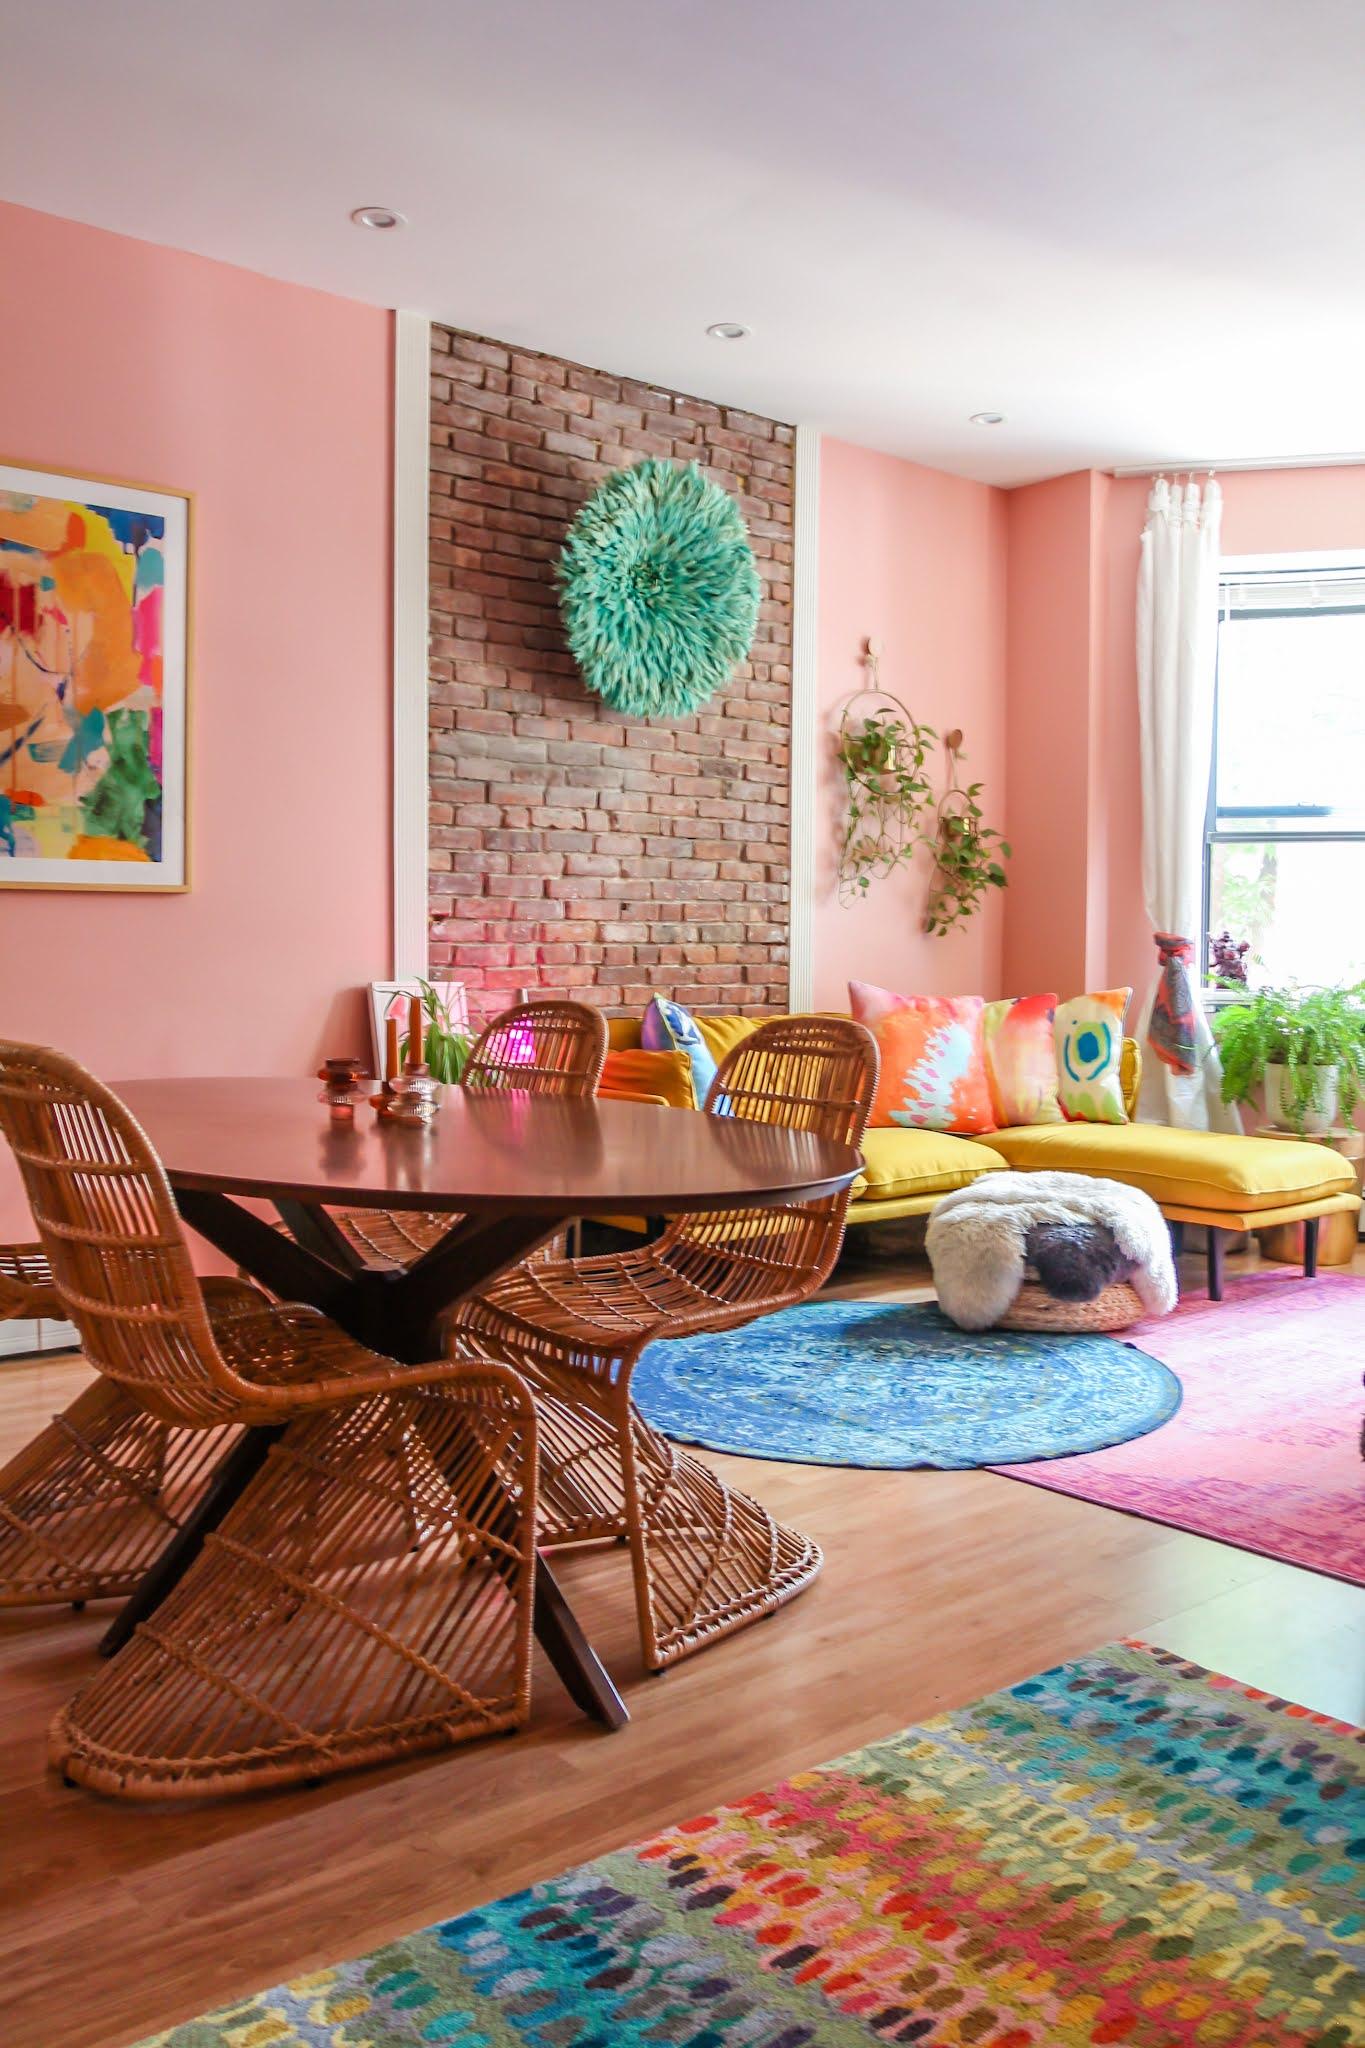 wallpaper ideas // colorful homes // maximalist home decor // pink home decor // retro home decor // retro wallpaper ideas // entryway decor // entryway ideas // small space decor ideas // maximalist homes // yellow sofa // pink walls